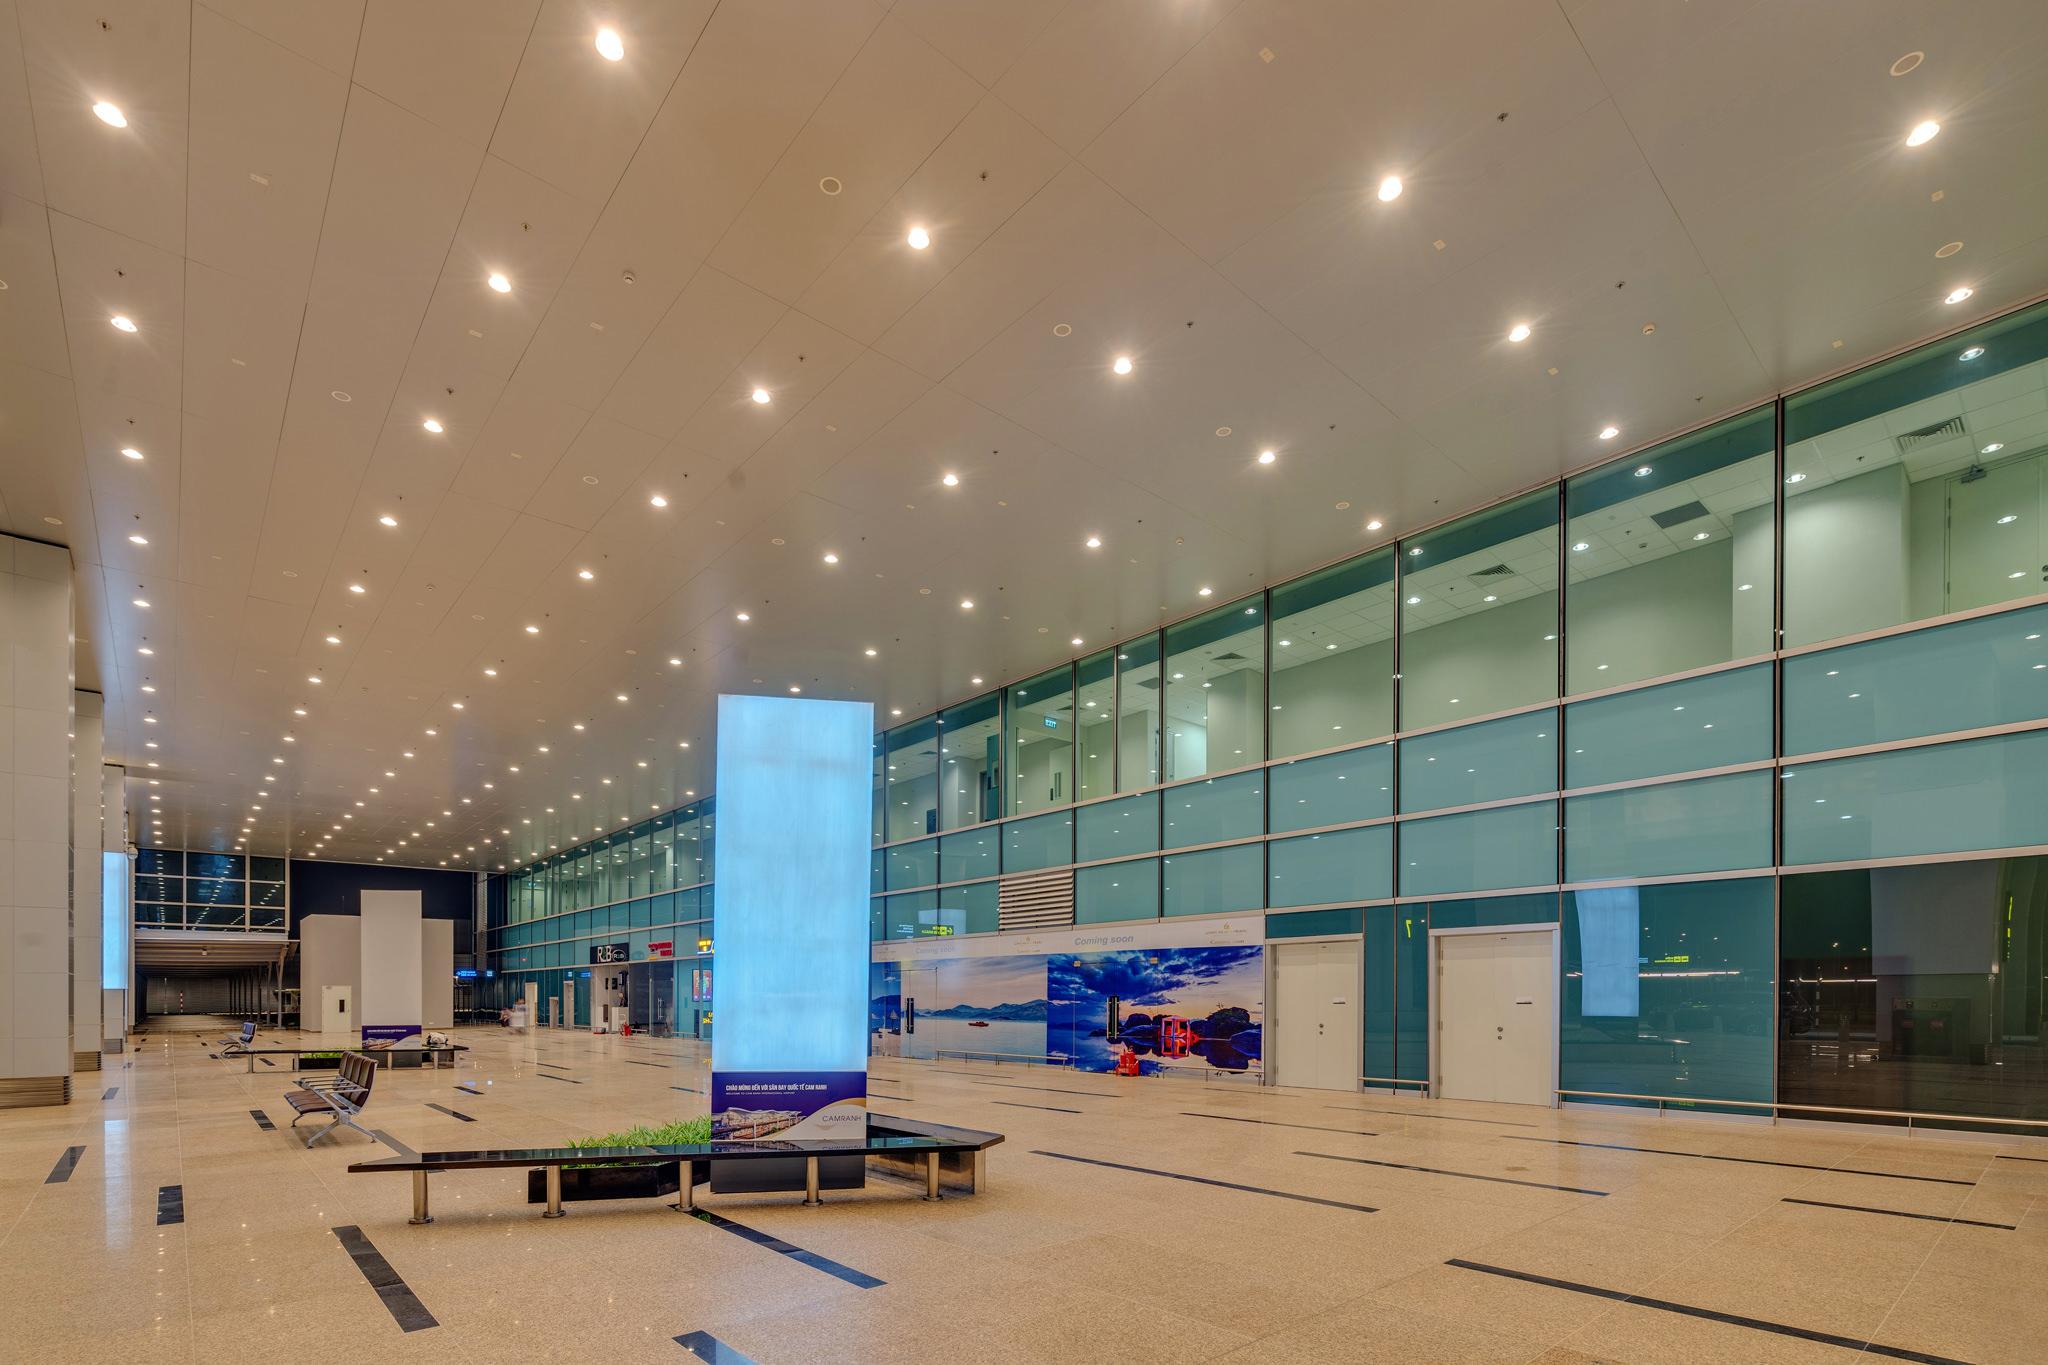 20180626 - Cam Ranh Airport - Architecture - 0423.jpg